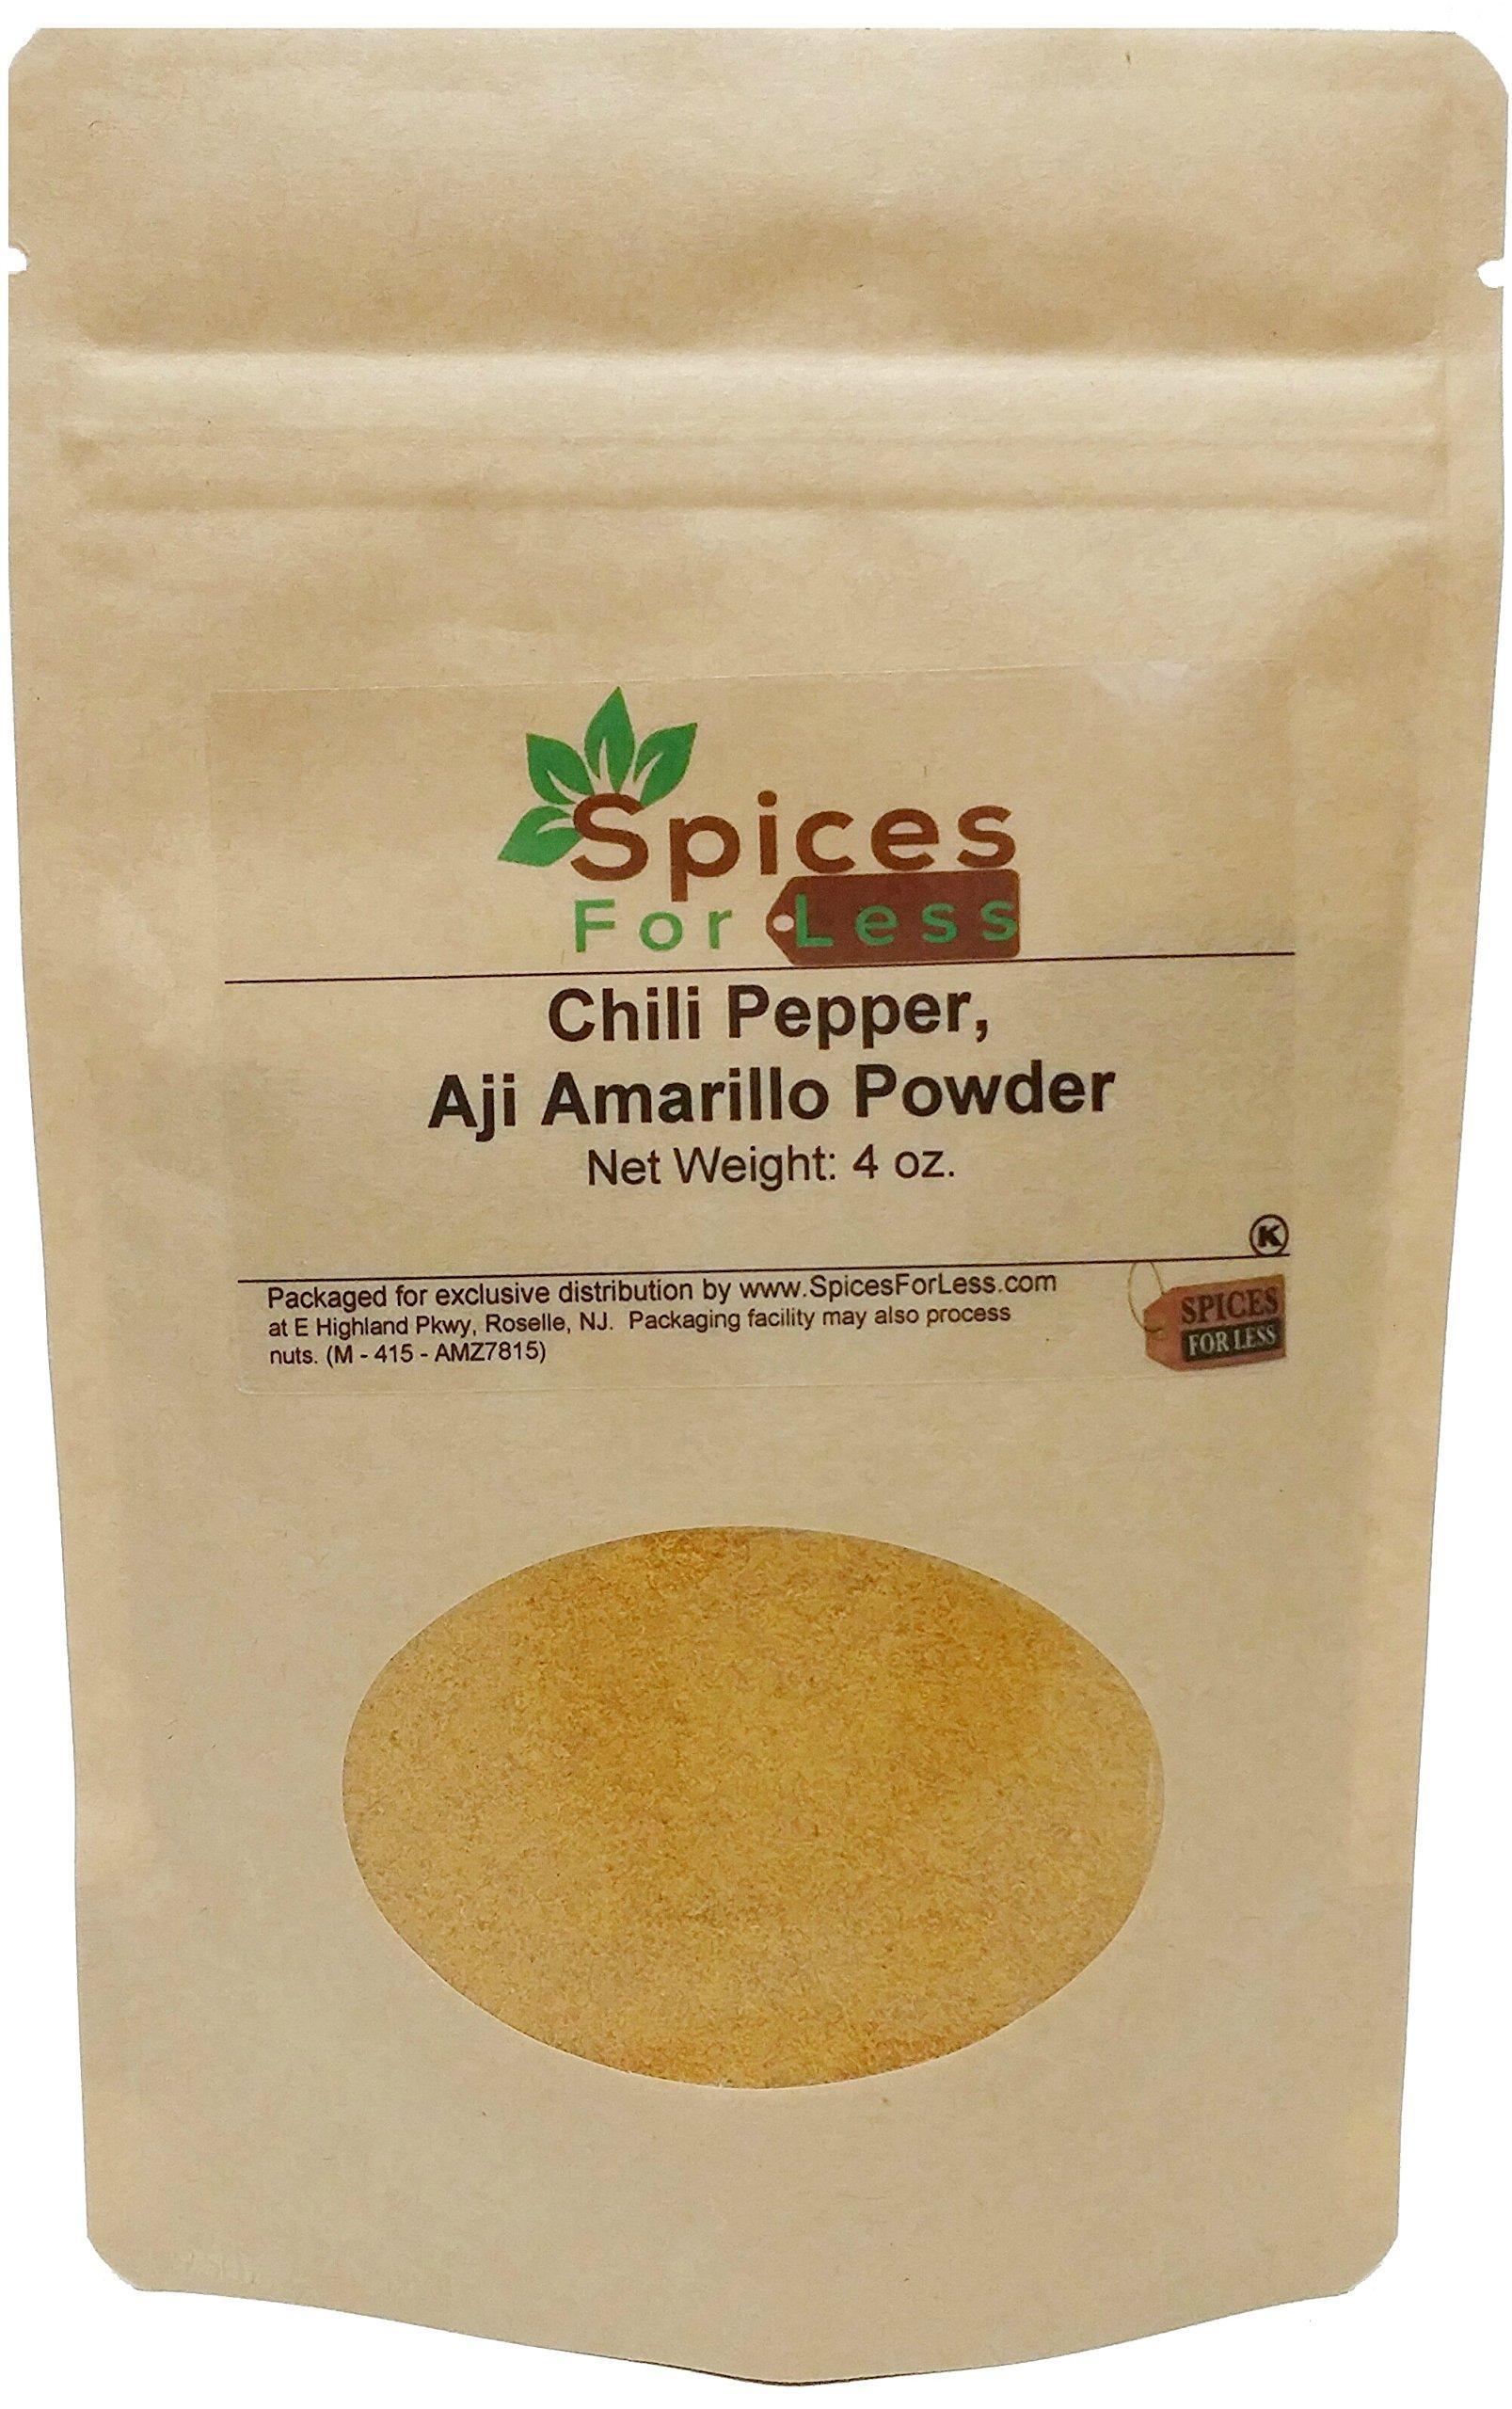 SFL Chili Pepper, Aji Amarillo Powder - 4 oz - Kosher Certified - Premium Quality